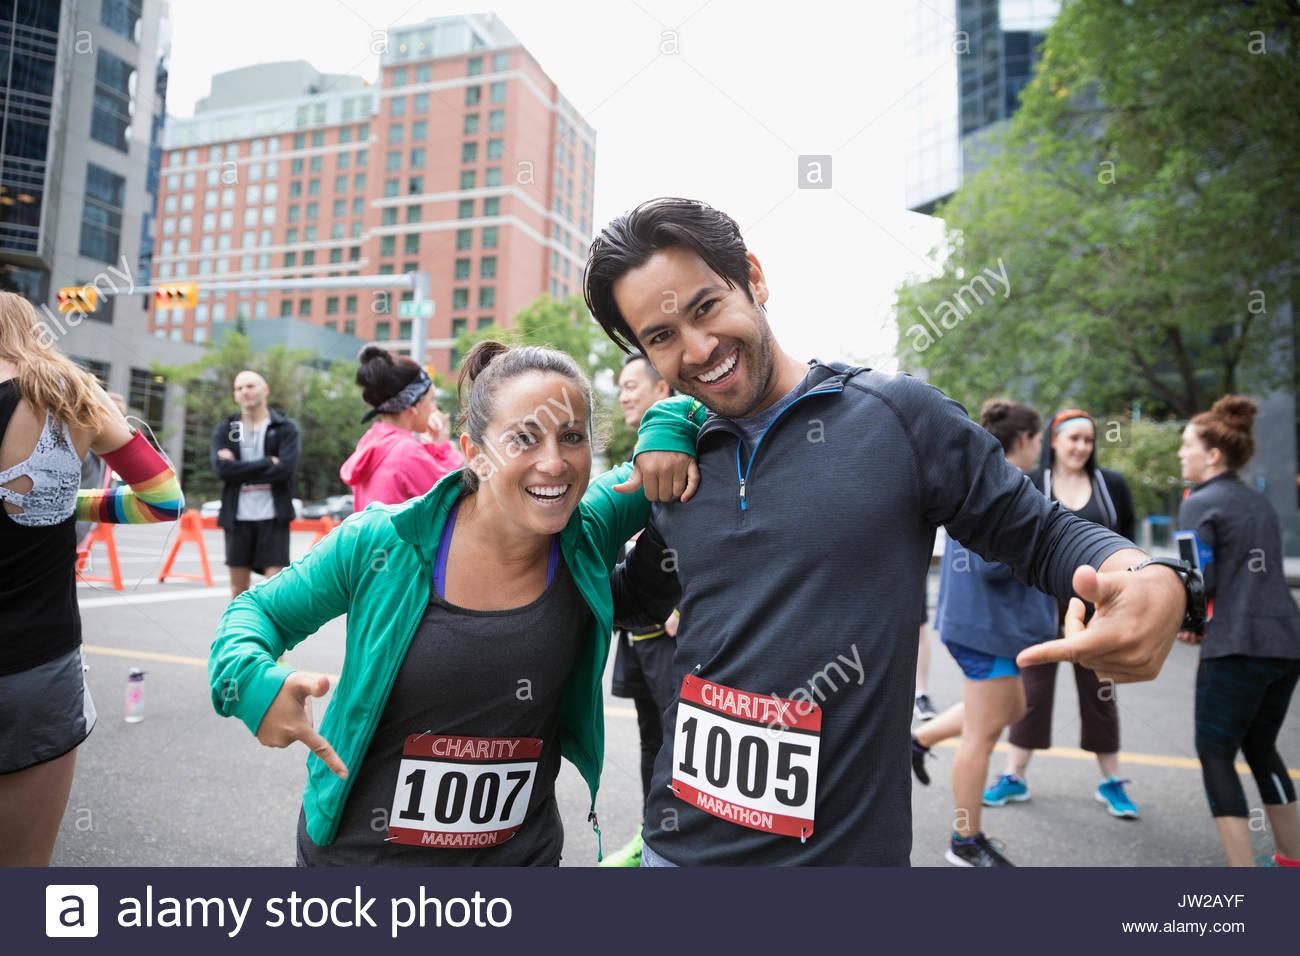 Portrait enthusiastic couple pointing to marathon bibs on urban street - Stock Image